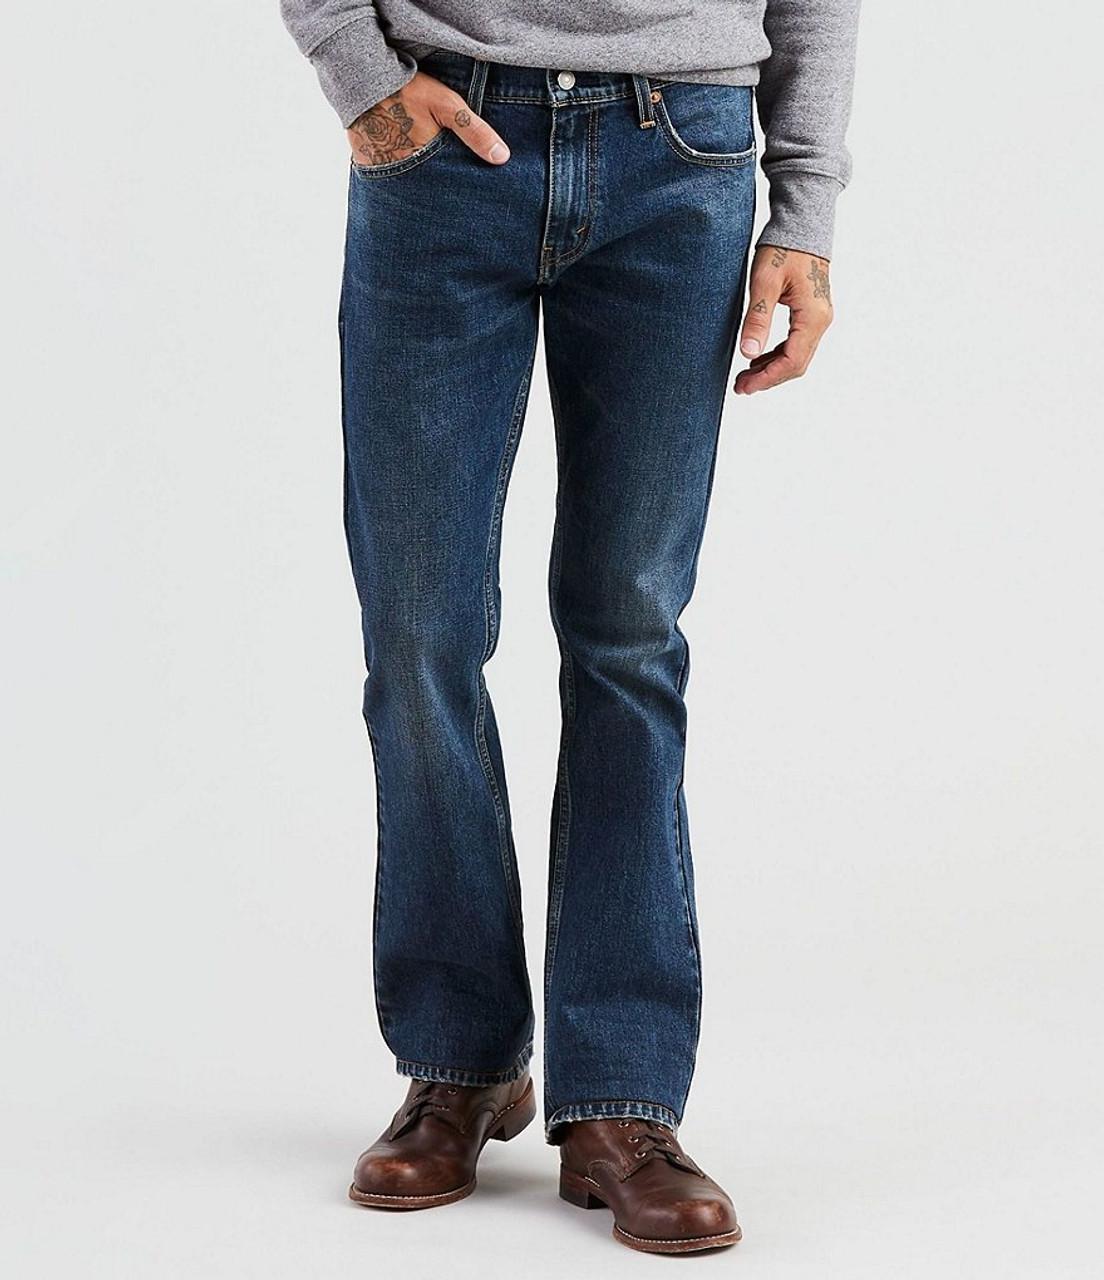 c70295f9090 527-0554 Slim Fit Stonewash Boot Cut Stretch Jeans Quickstep Indigo ...